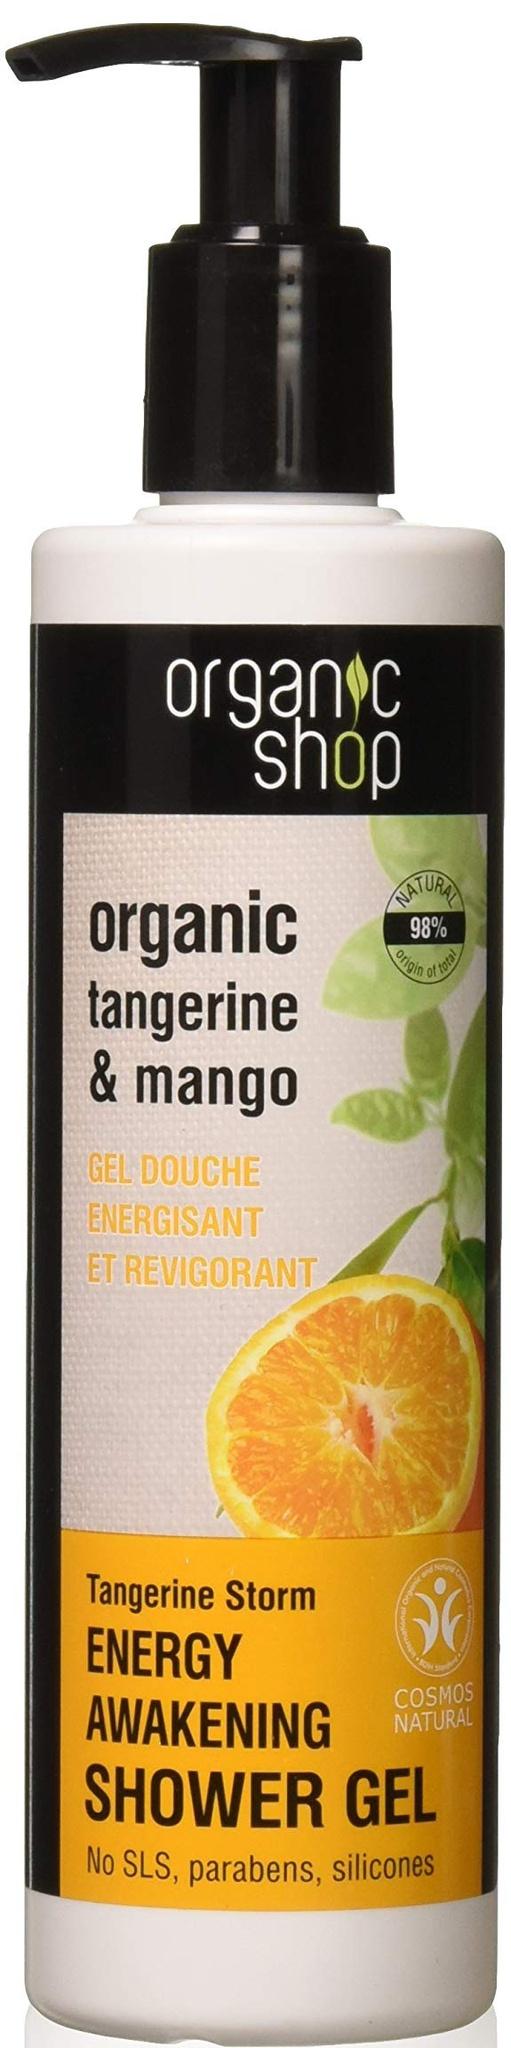 Organic Shop Tangerine Storm Energy Shower Gel